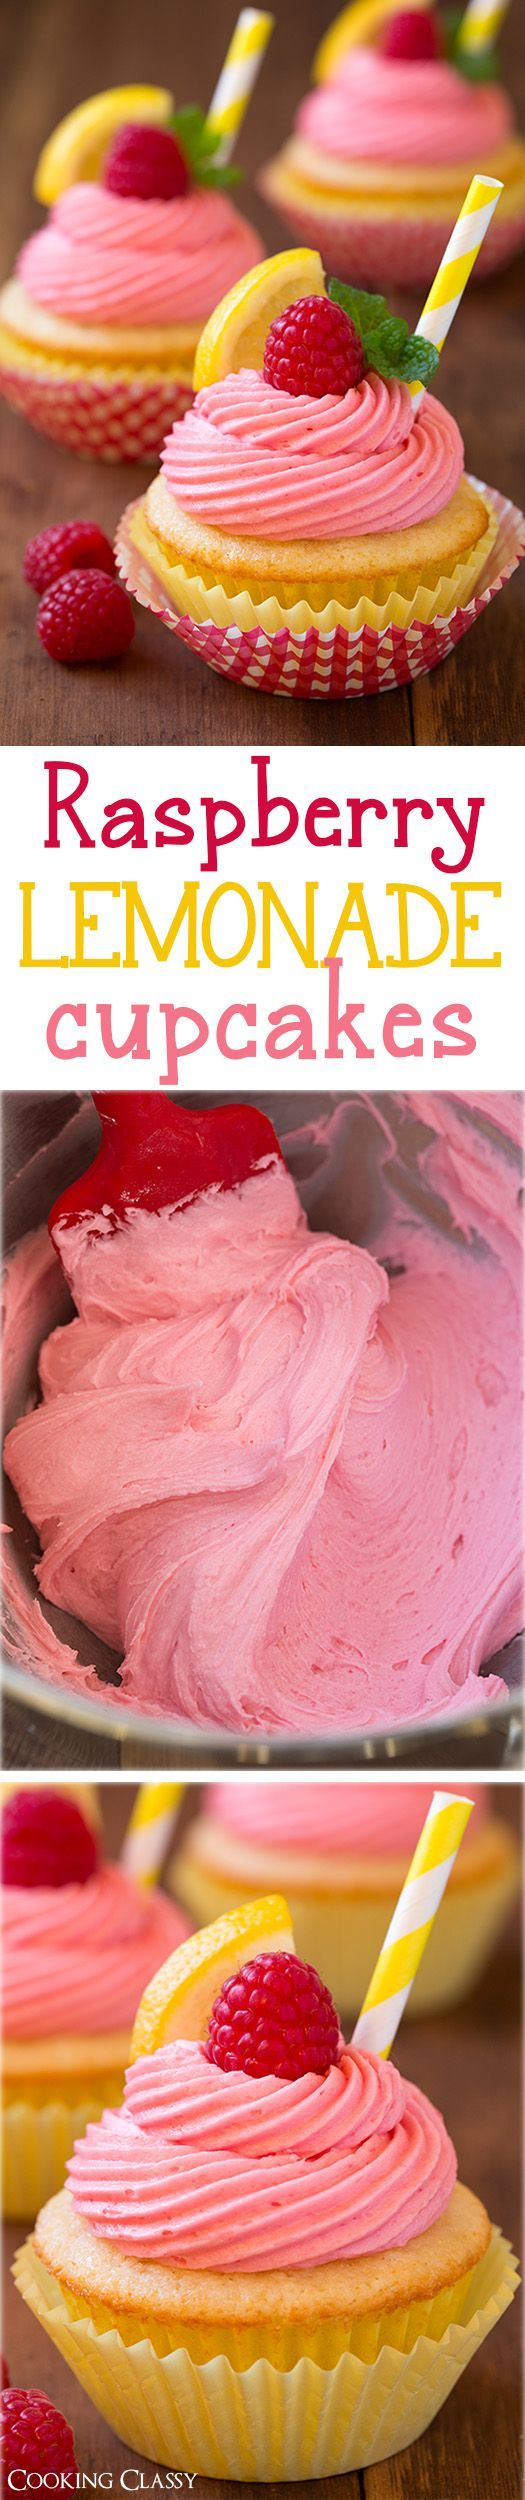 Raspberry Lemonade Cupcakes – fresh lemon cupcakes and fresh raspberry buttercream frosting. Summery deliciousness! Love these!